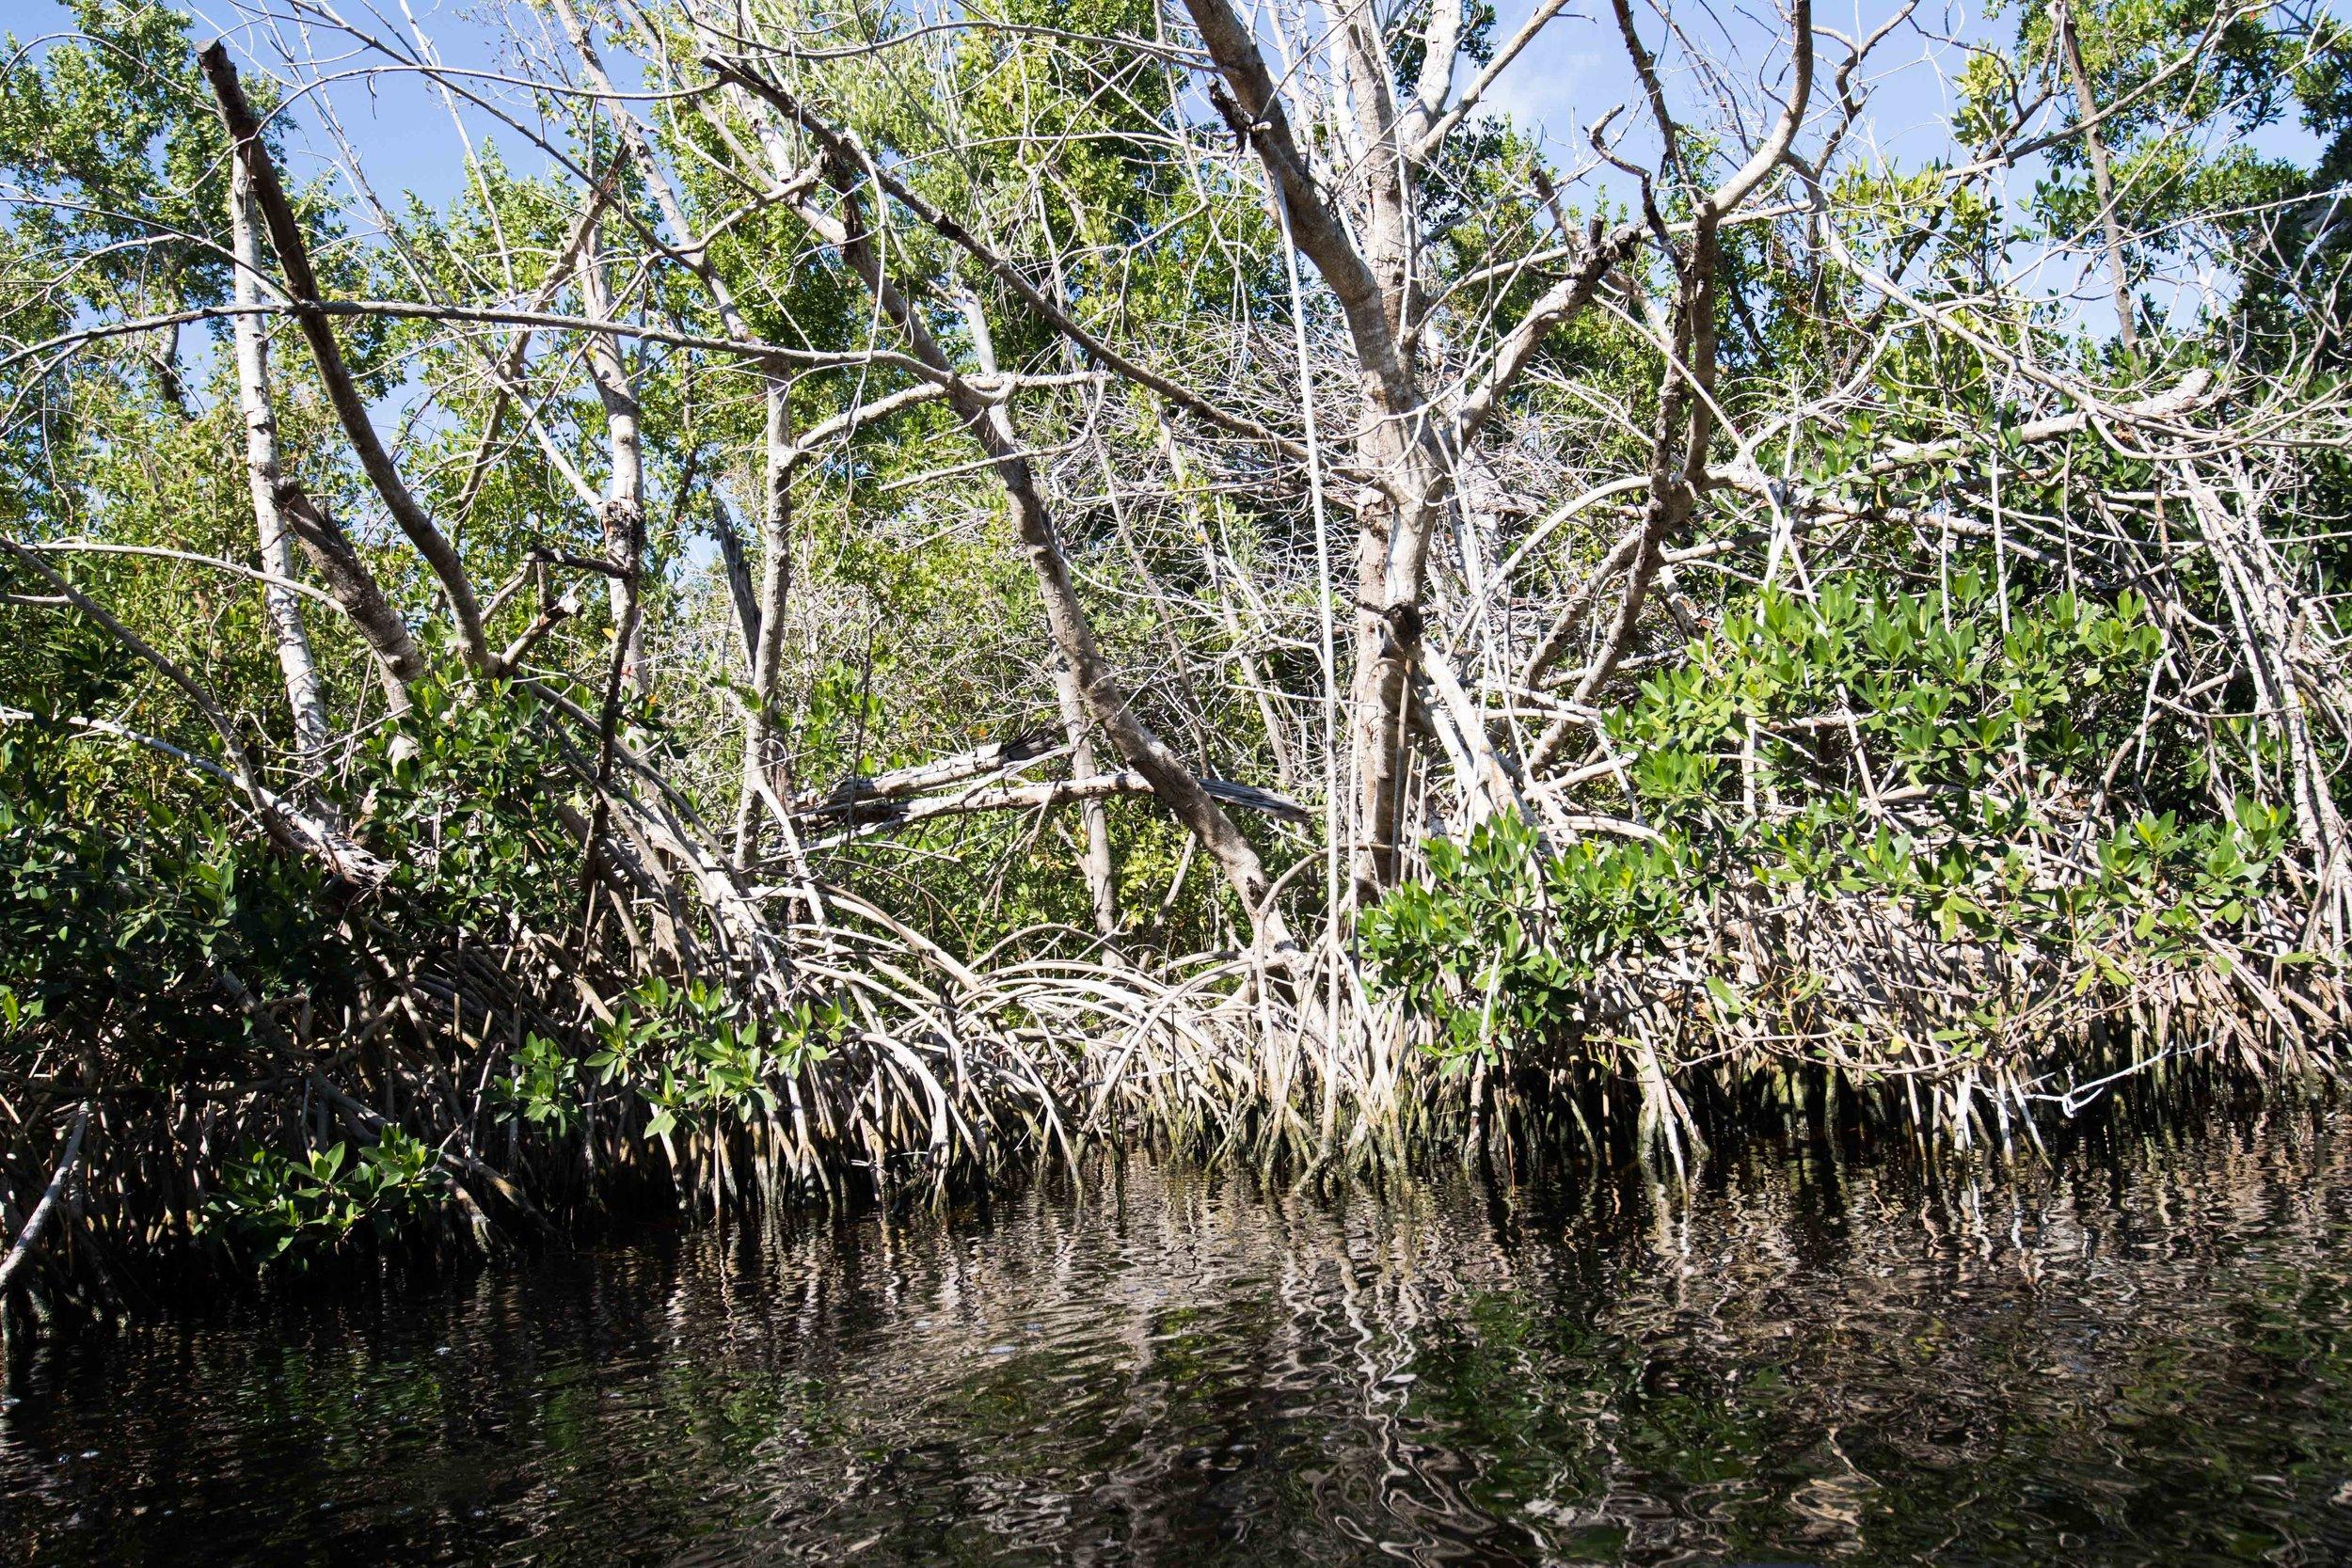 2019_Everglades-32.jpg